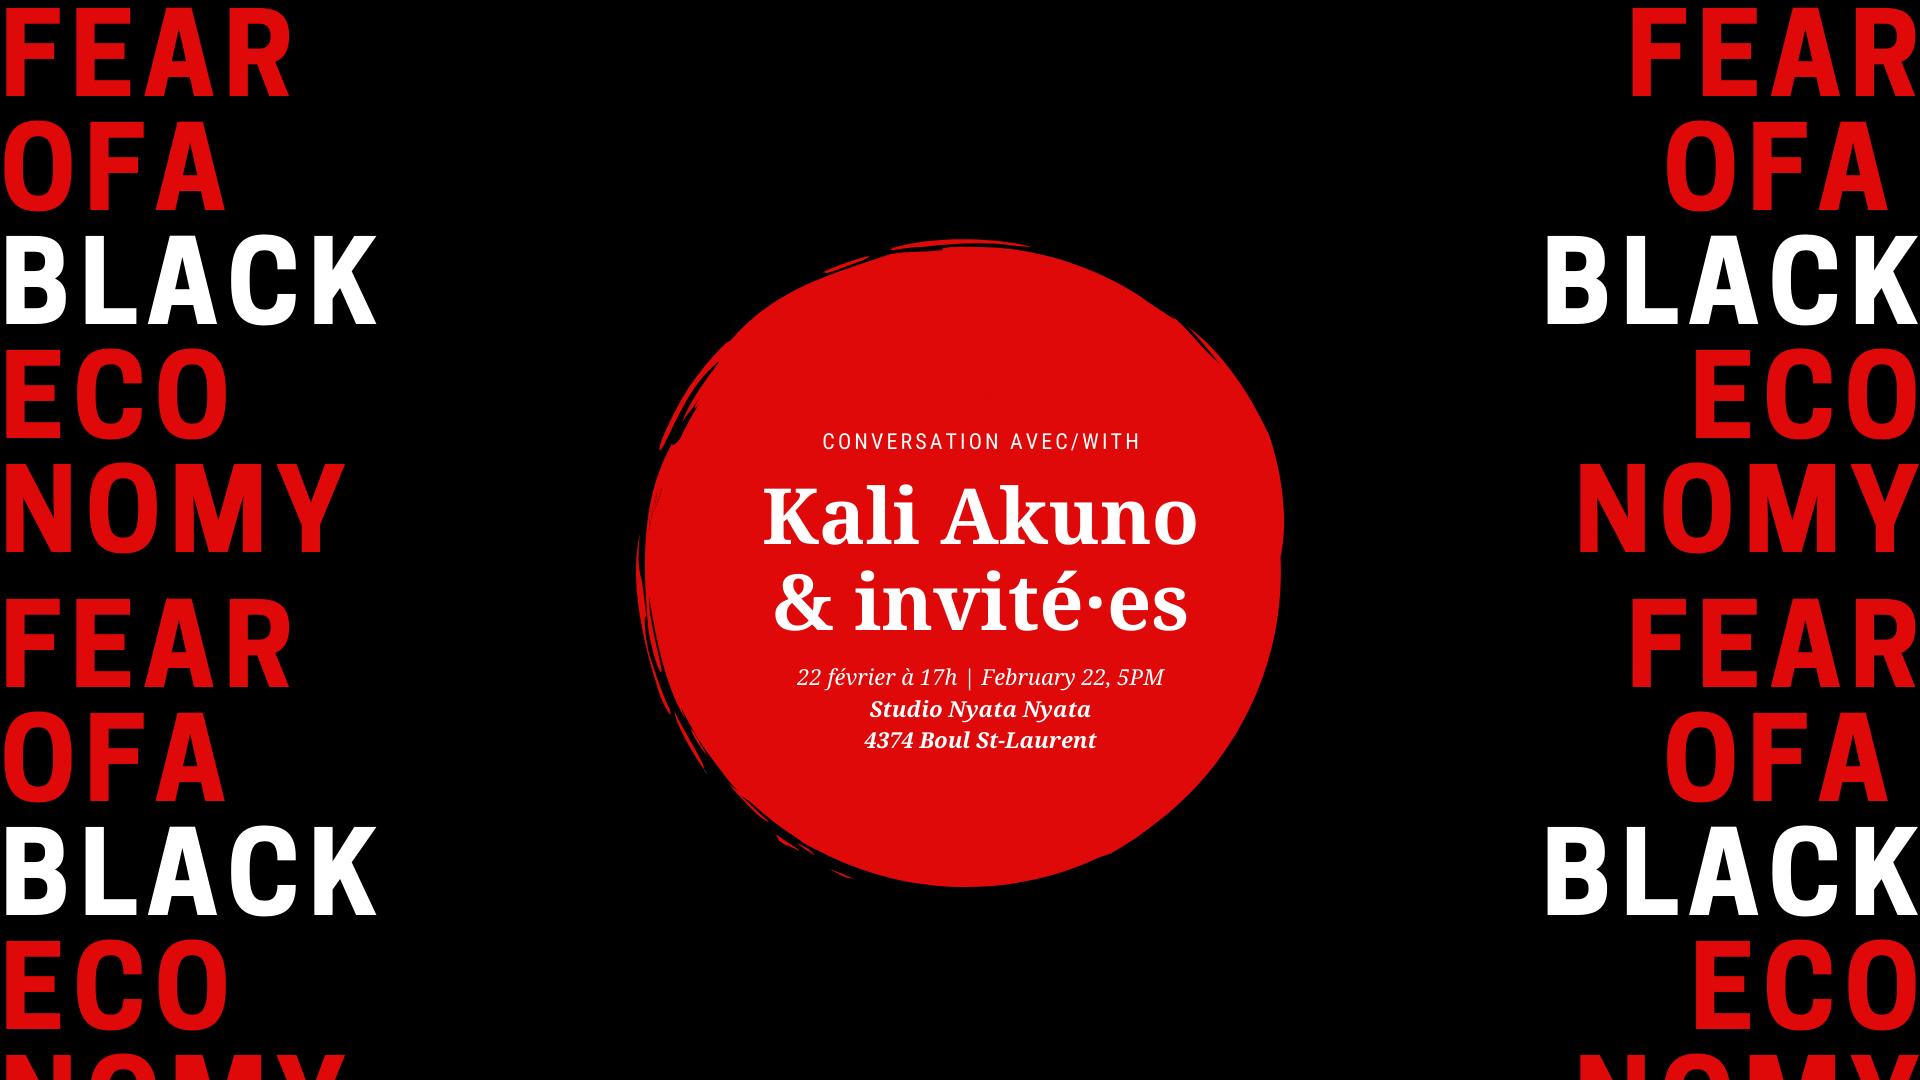 Fear of a Black Economy: Conversation avec Kali Akuno & invité·e·s